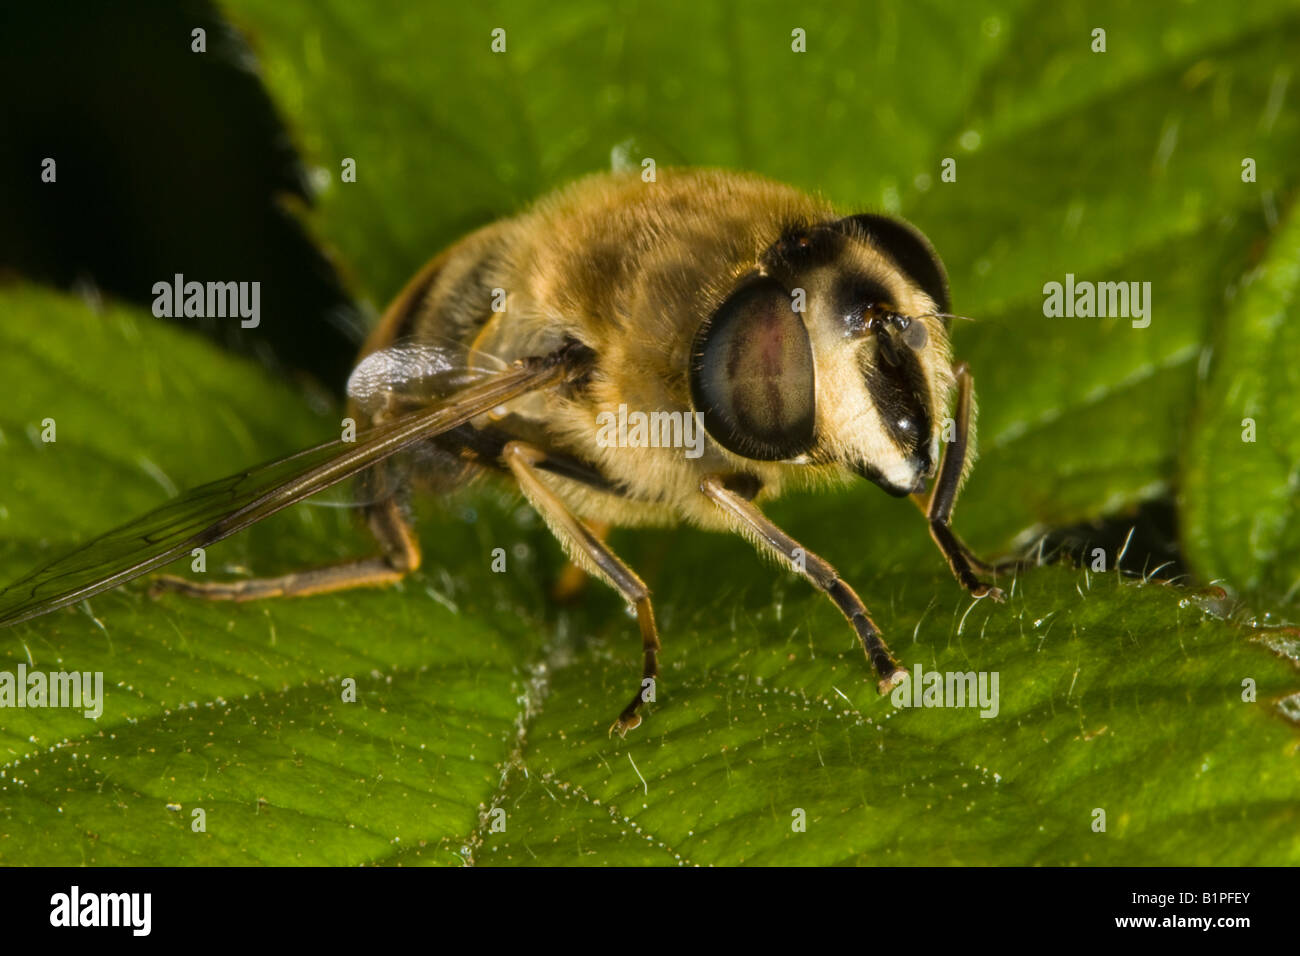 Drone Fly (Eristalis tenax) - a mimic of European Honeybee - Stock Image